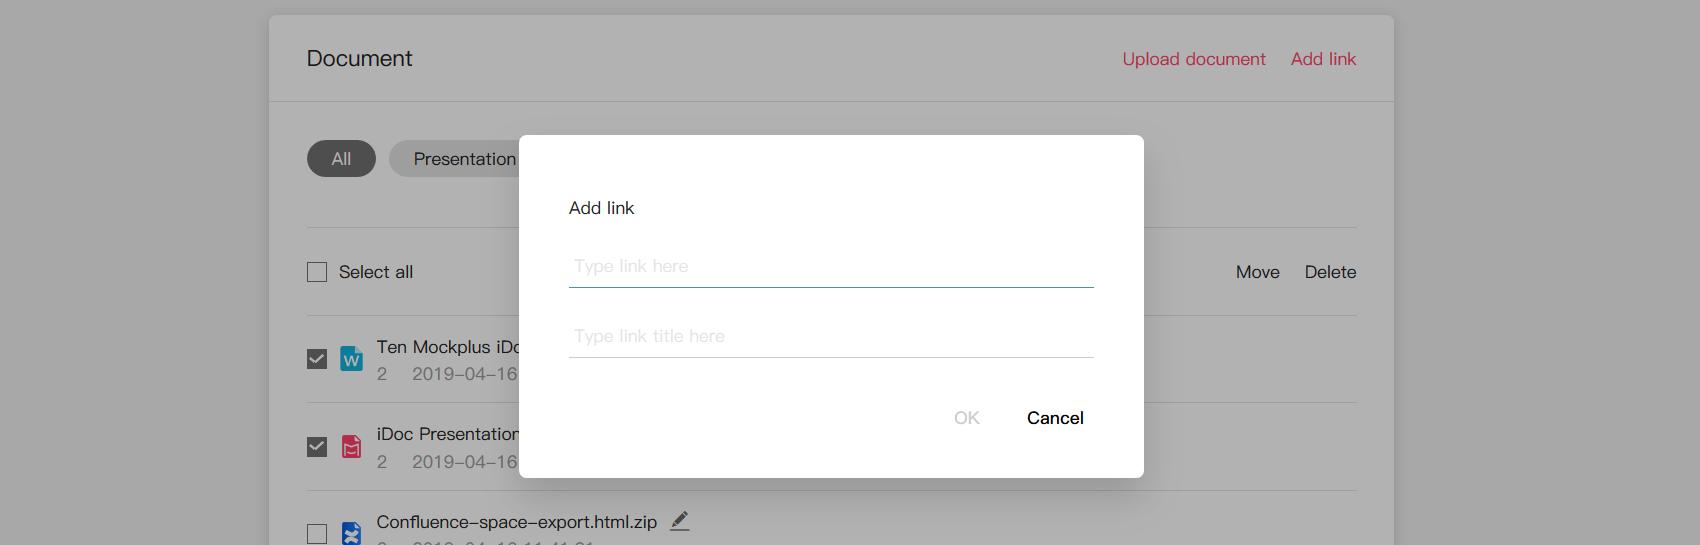 Add design links for better management